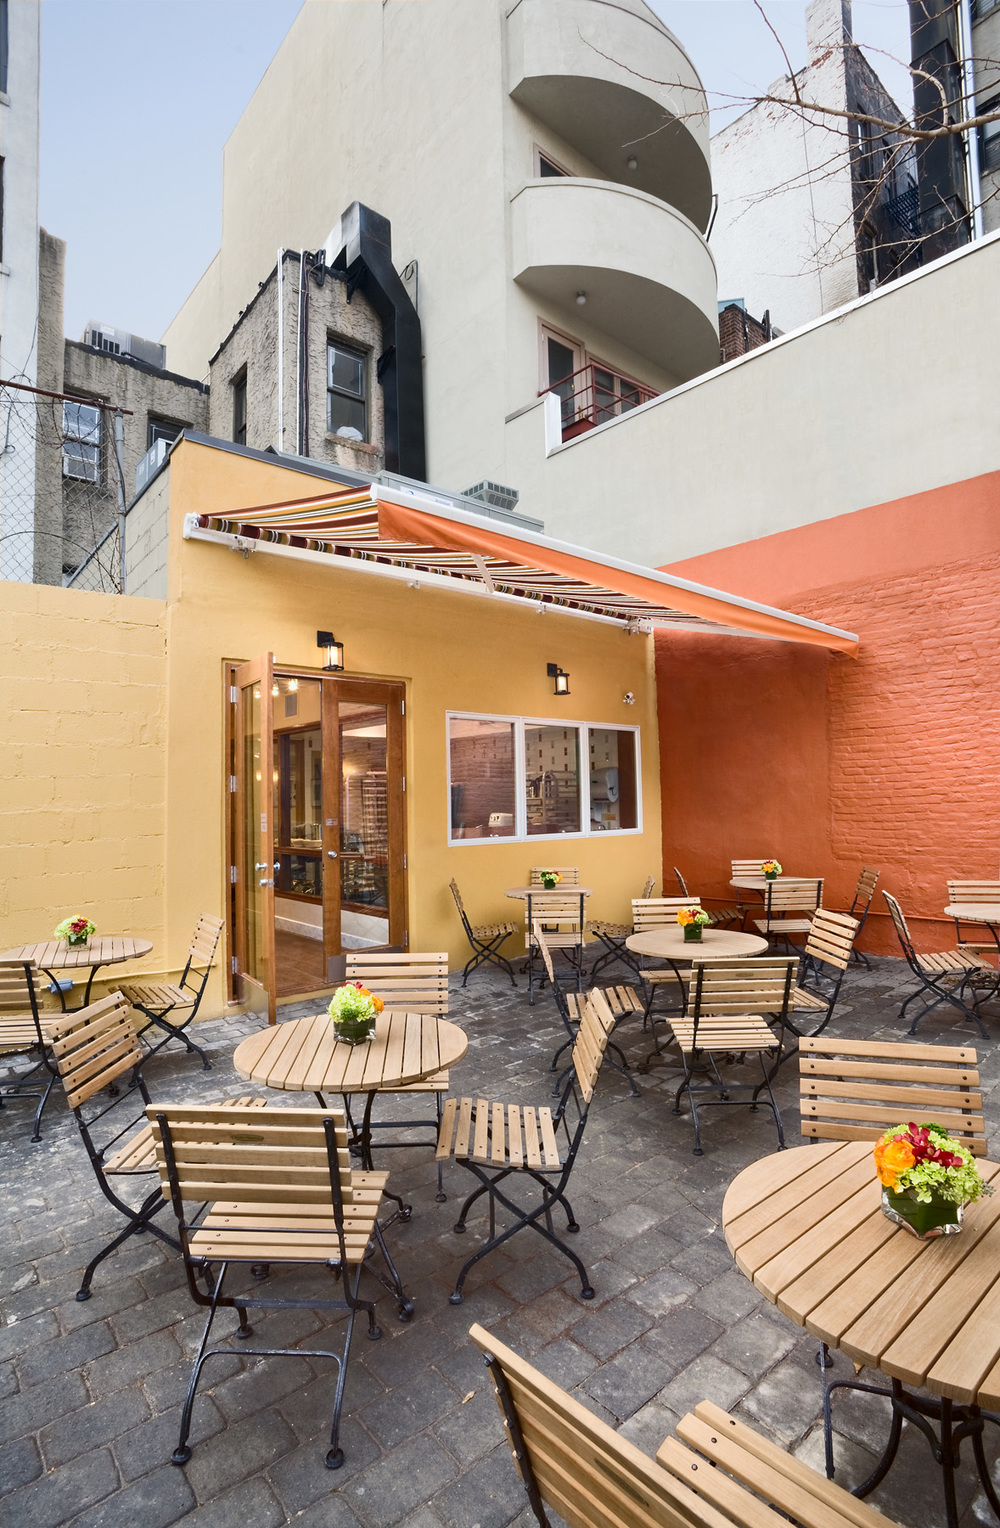 Tobin Parnes Design. Rheon Cafe. NYC. Hospitality Design. Restaurant. Cafe. Bakery. Patio. Outdoors. Exterior.